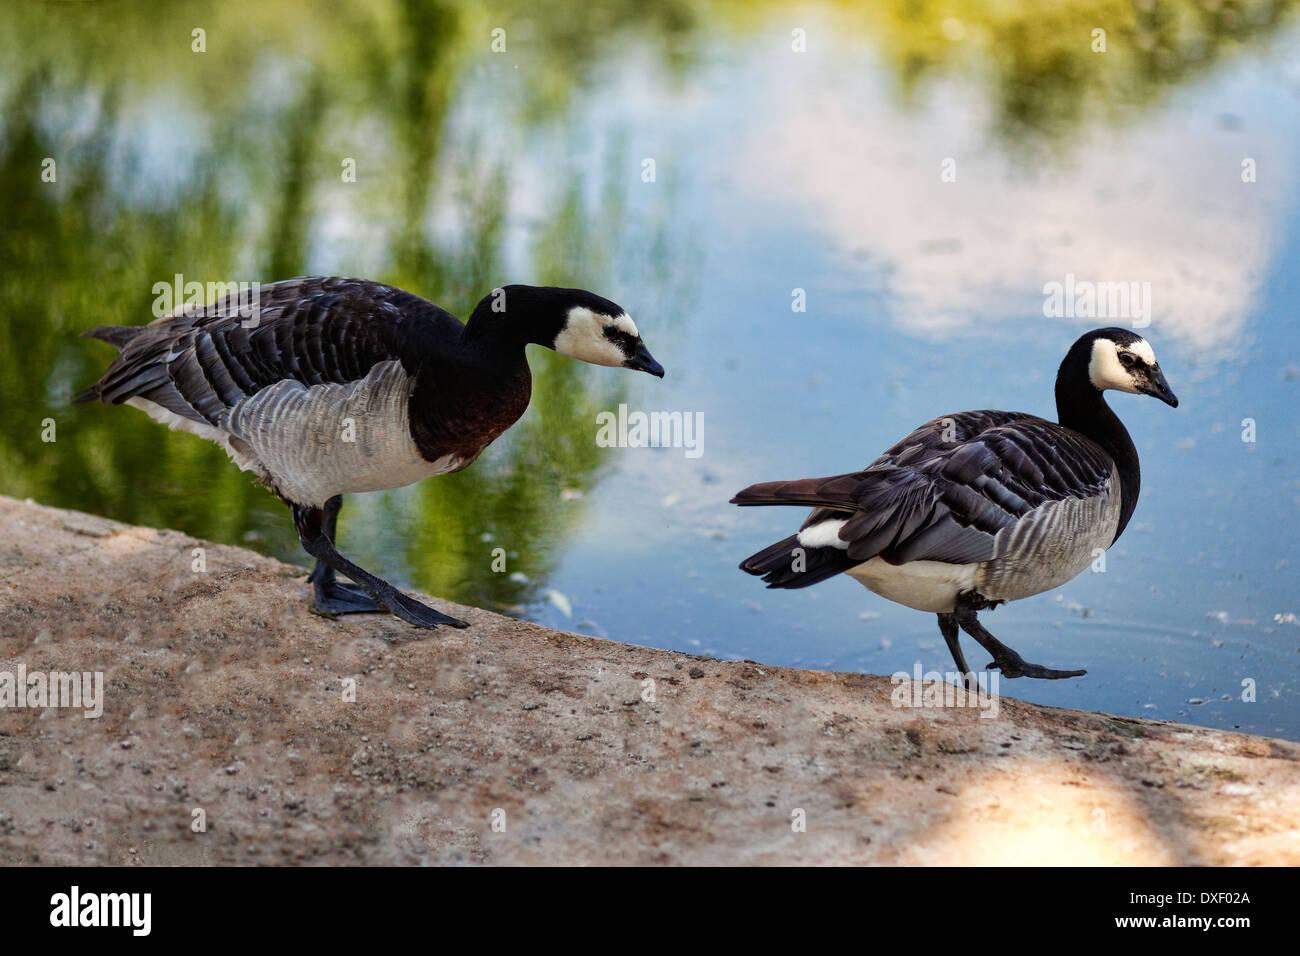 Beautiful birds in the zoo - Stock Image